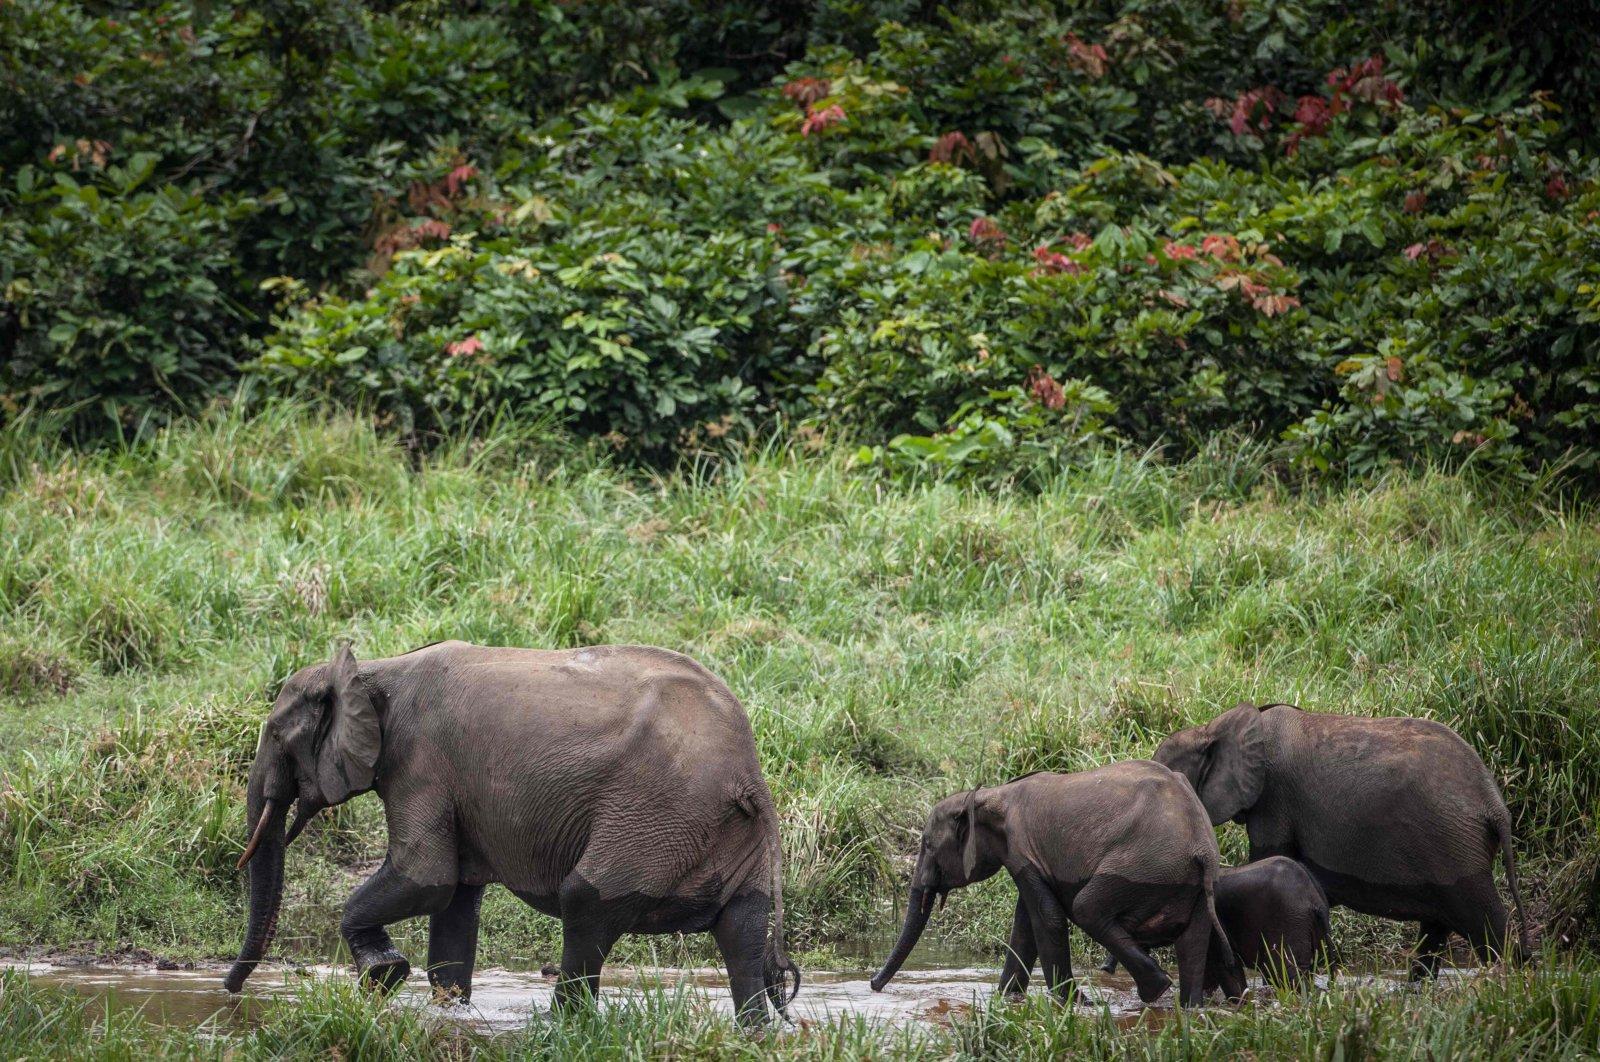 A group of forest elephants wades through water at Langoue Bai in Ivindo National Park, near Makokou, Gabon, April 26, 2019. (AFP Photo)